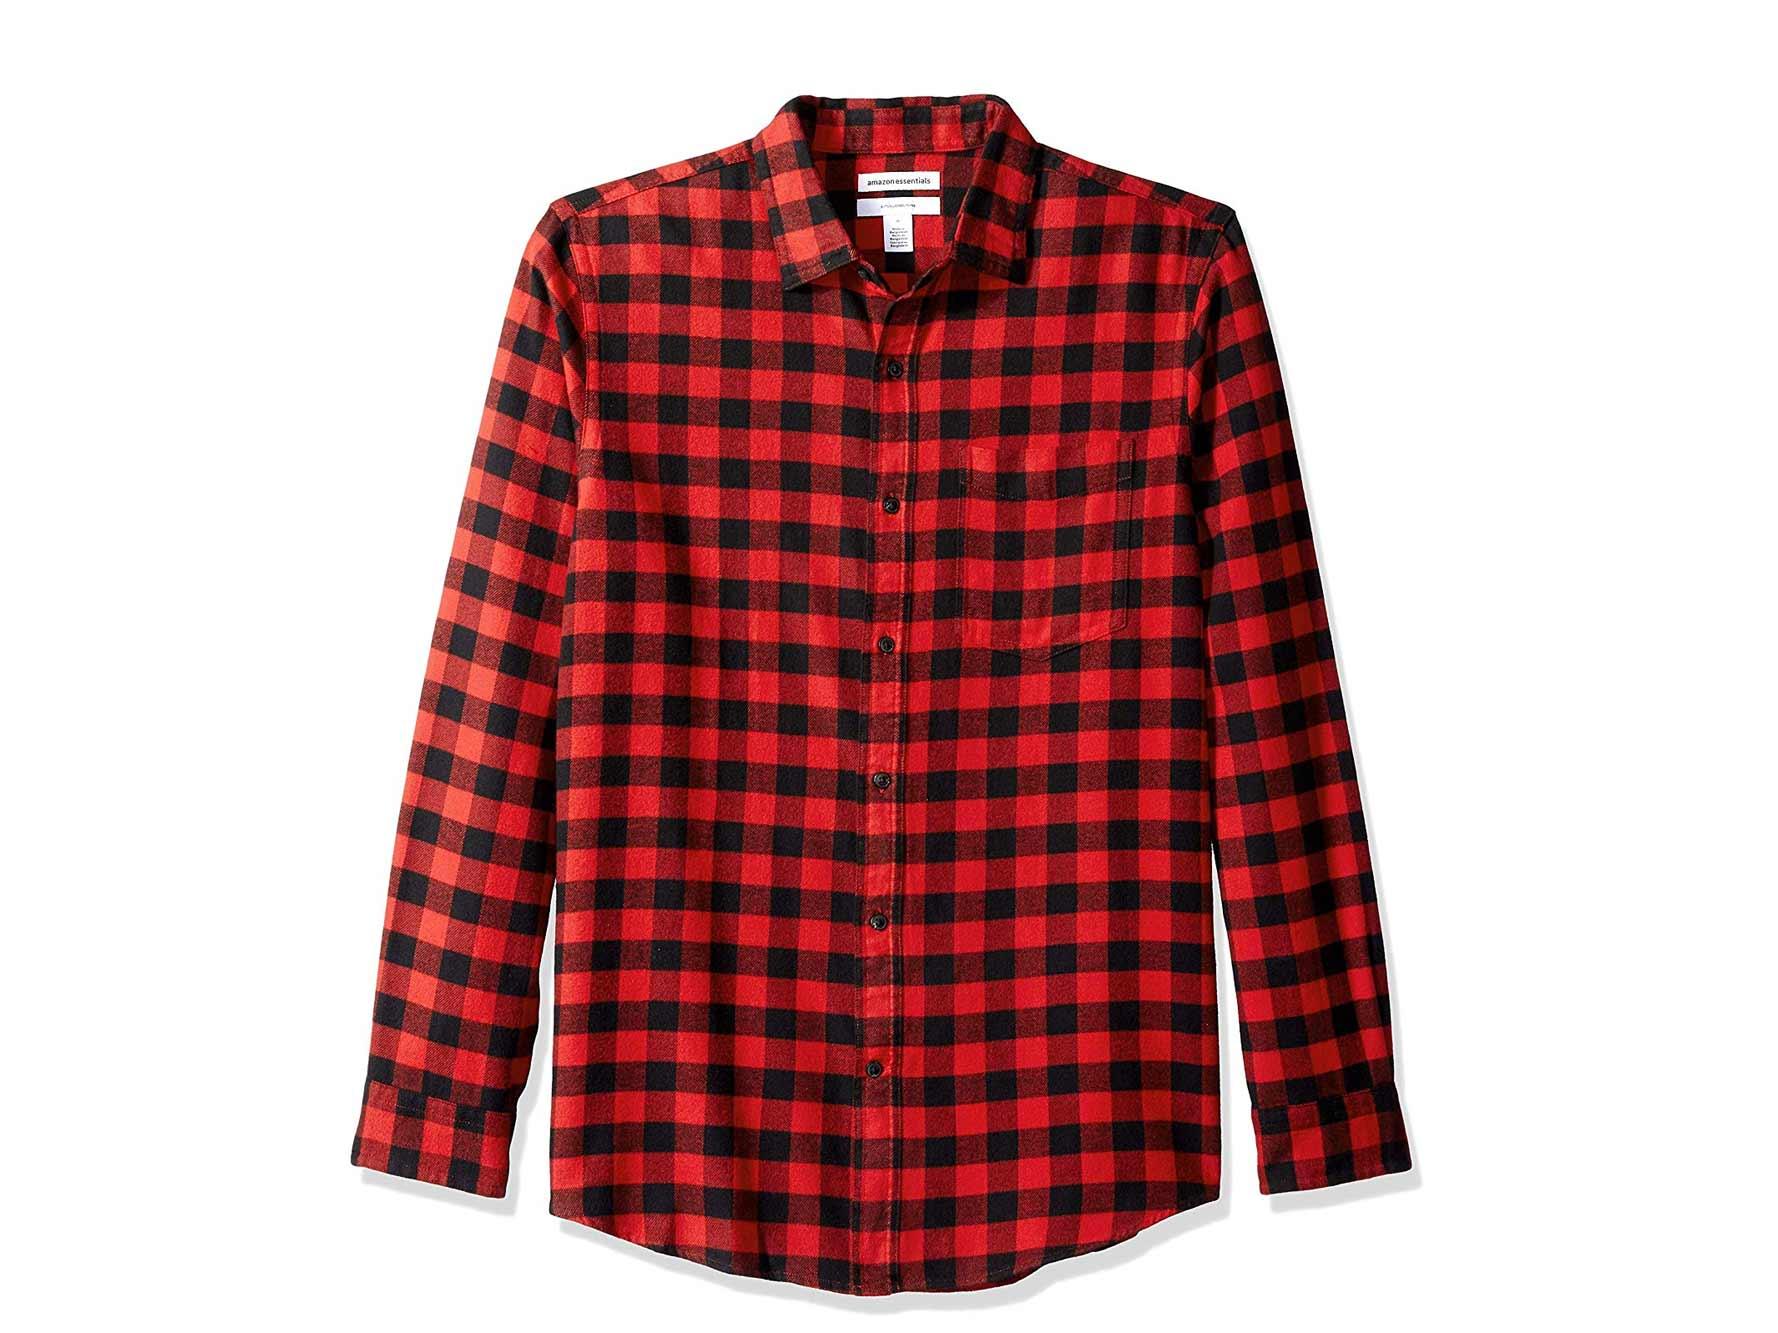 Red and black Amazon Basics plaid shirt